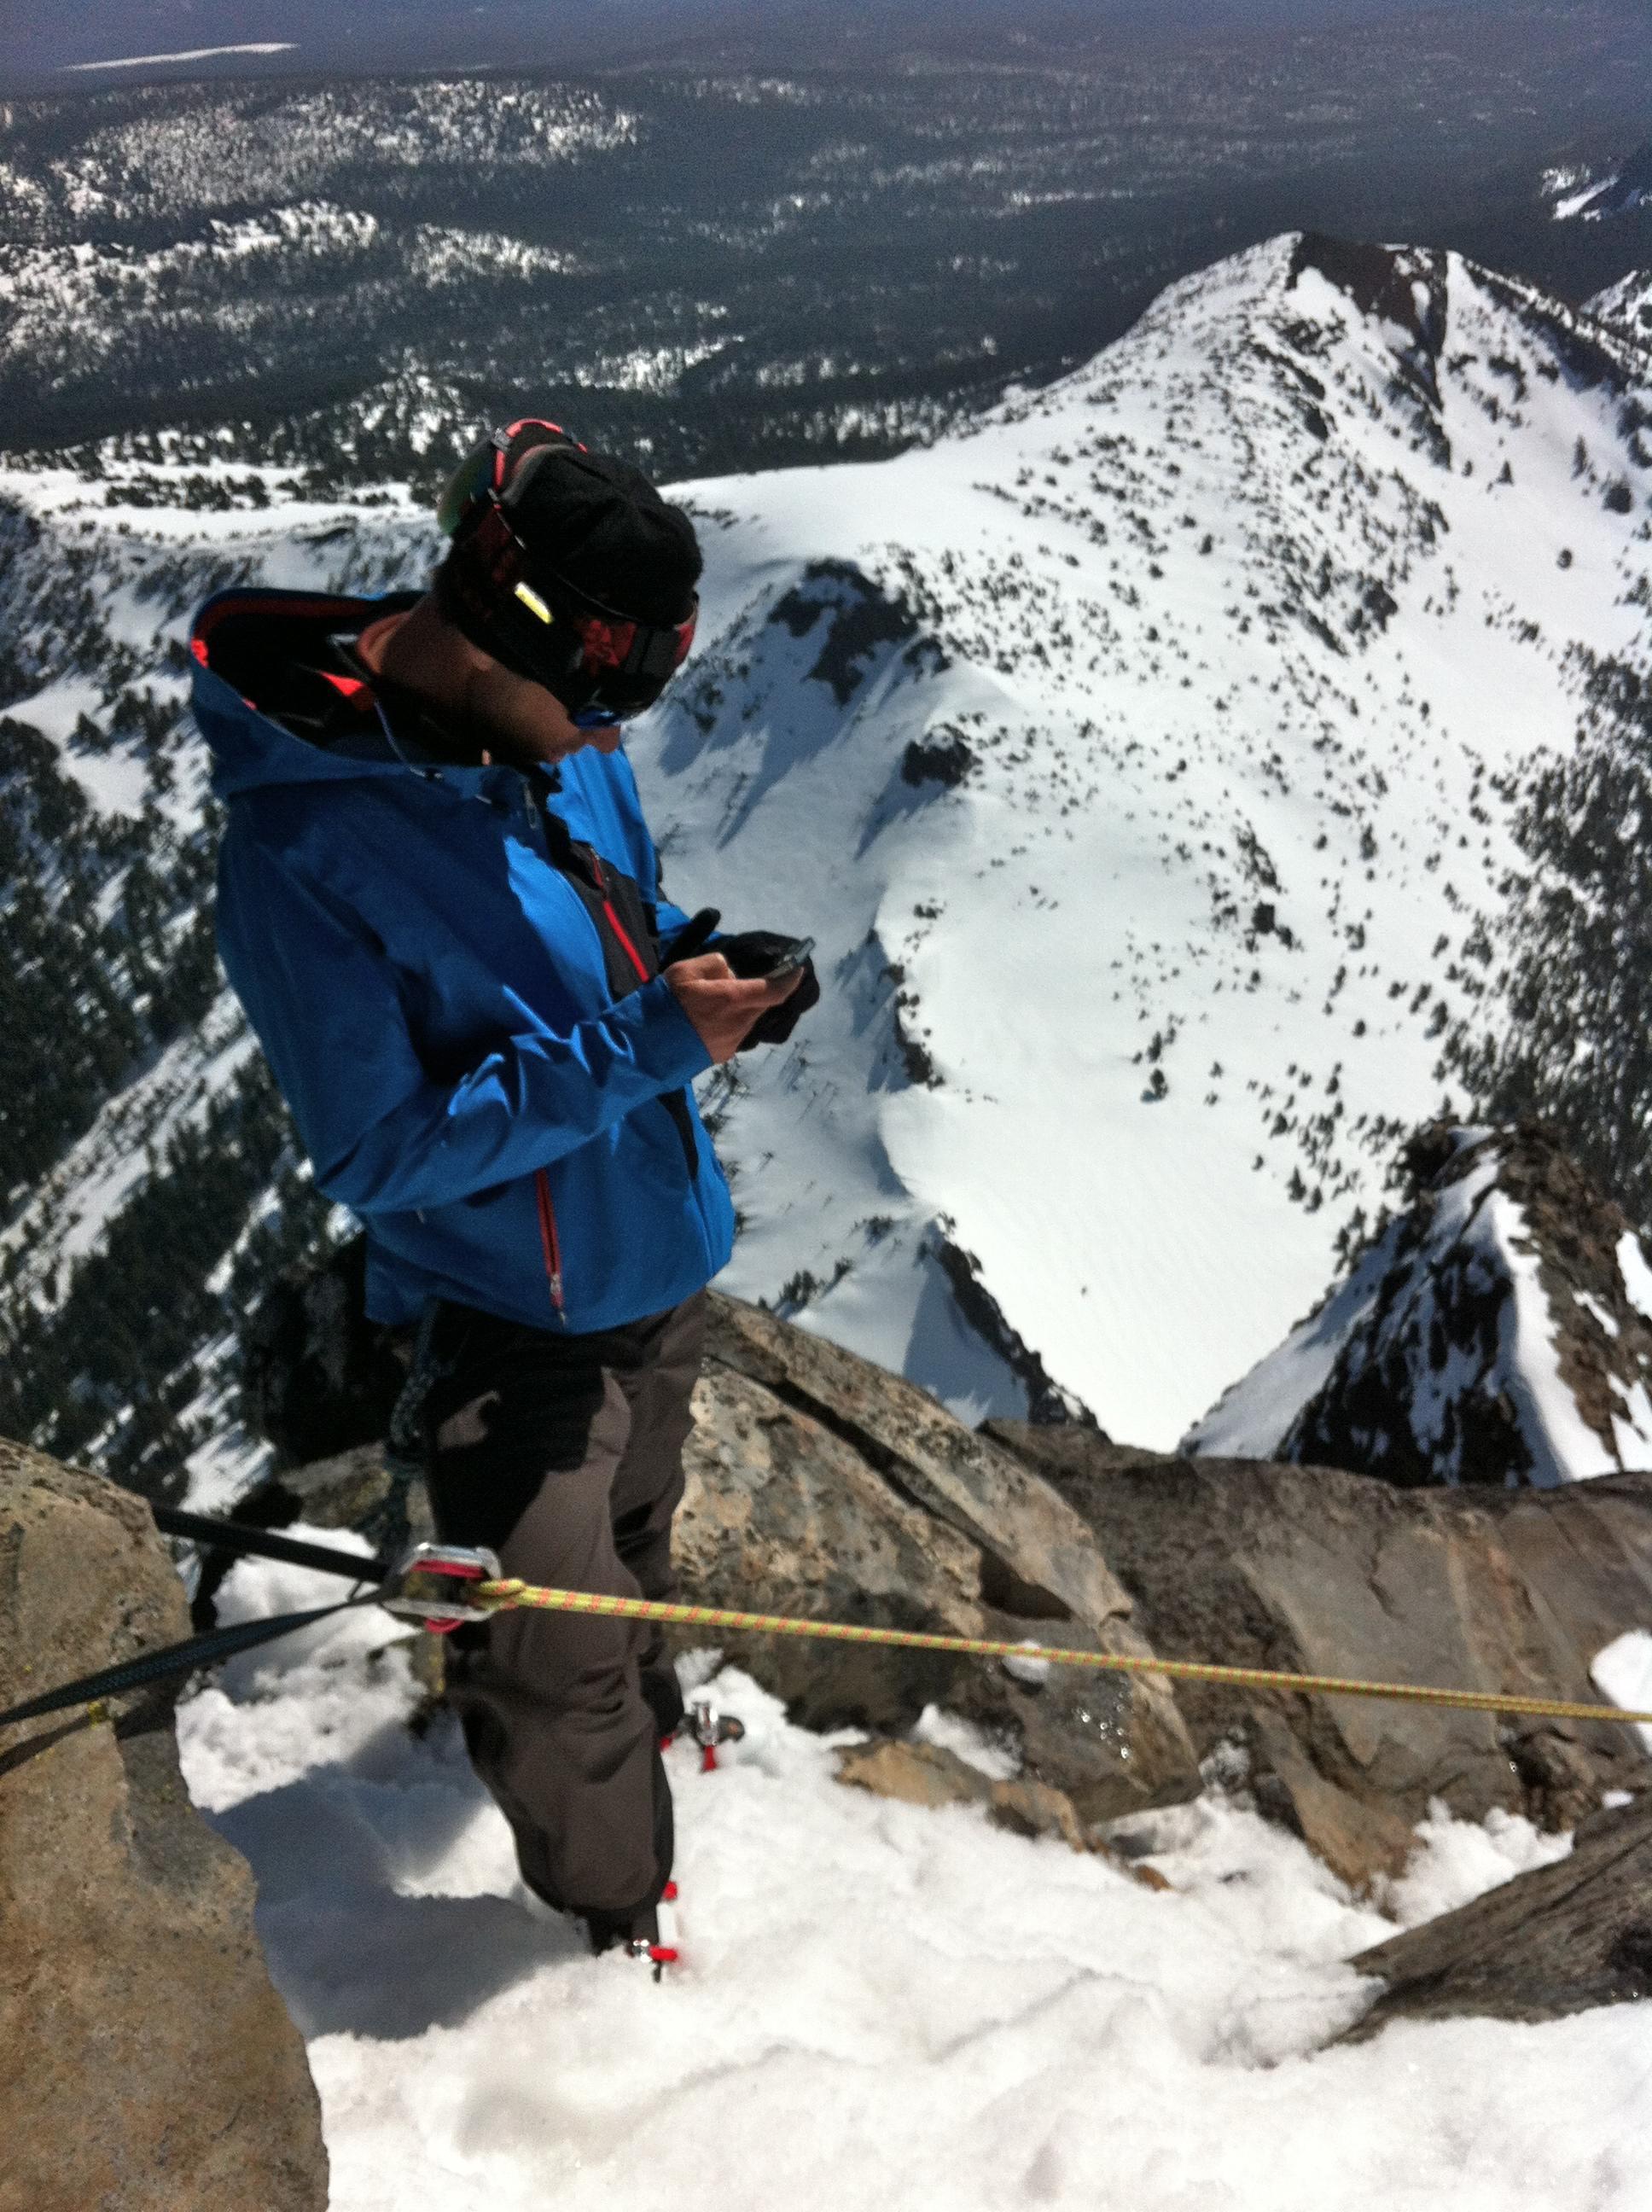 Chris Davenport on the summit of Oregon's Mount Thielsen